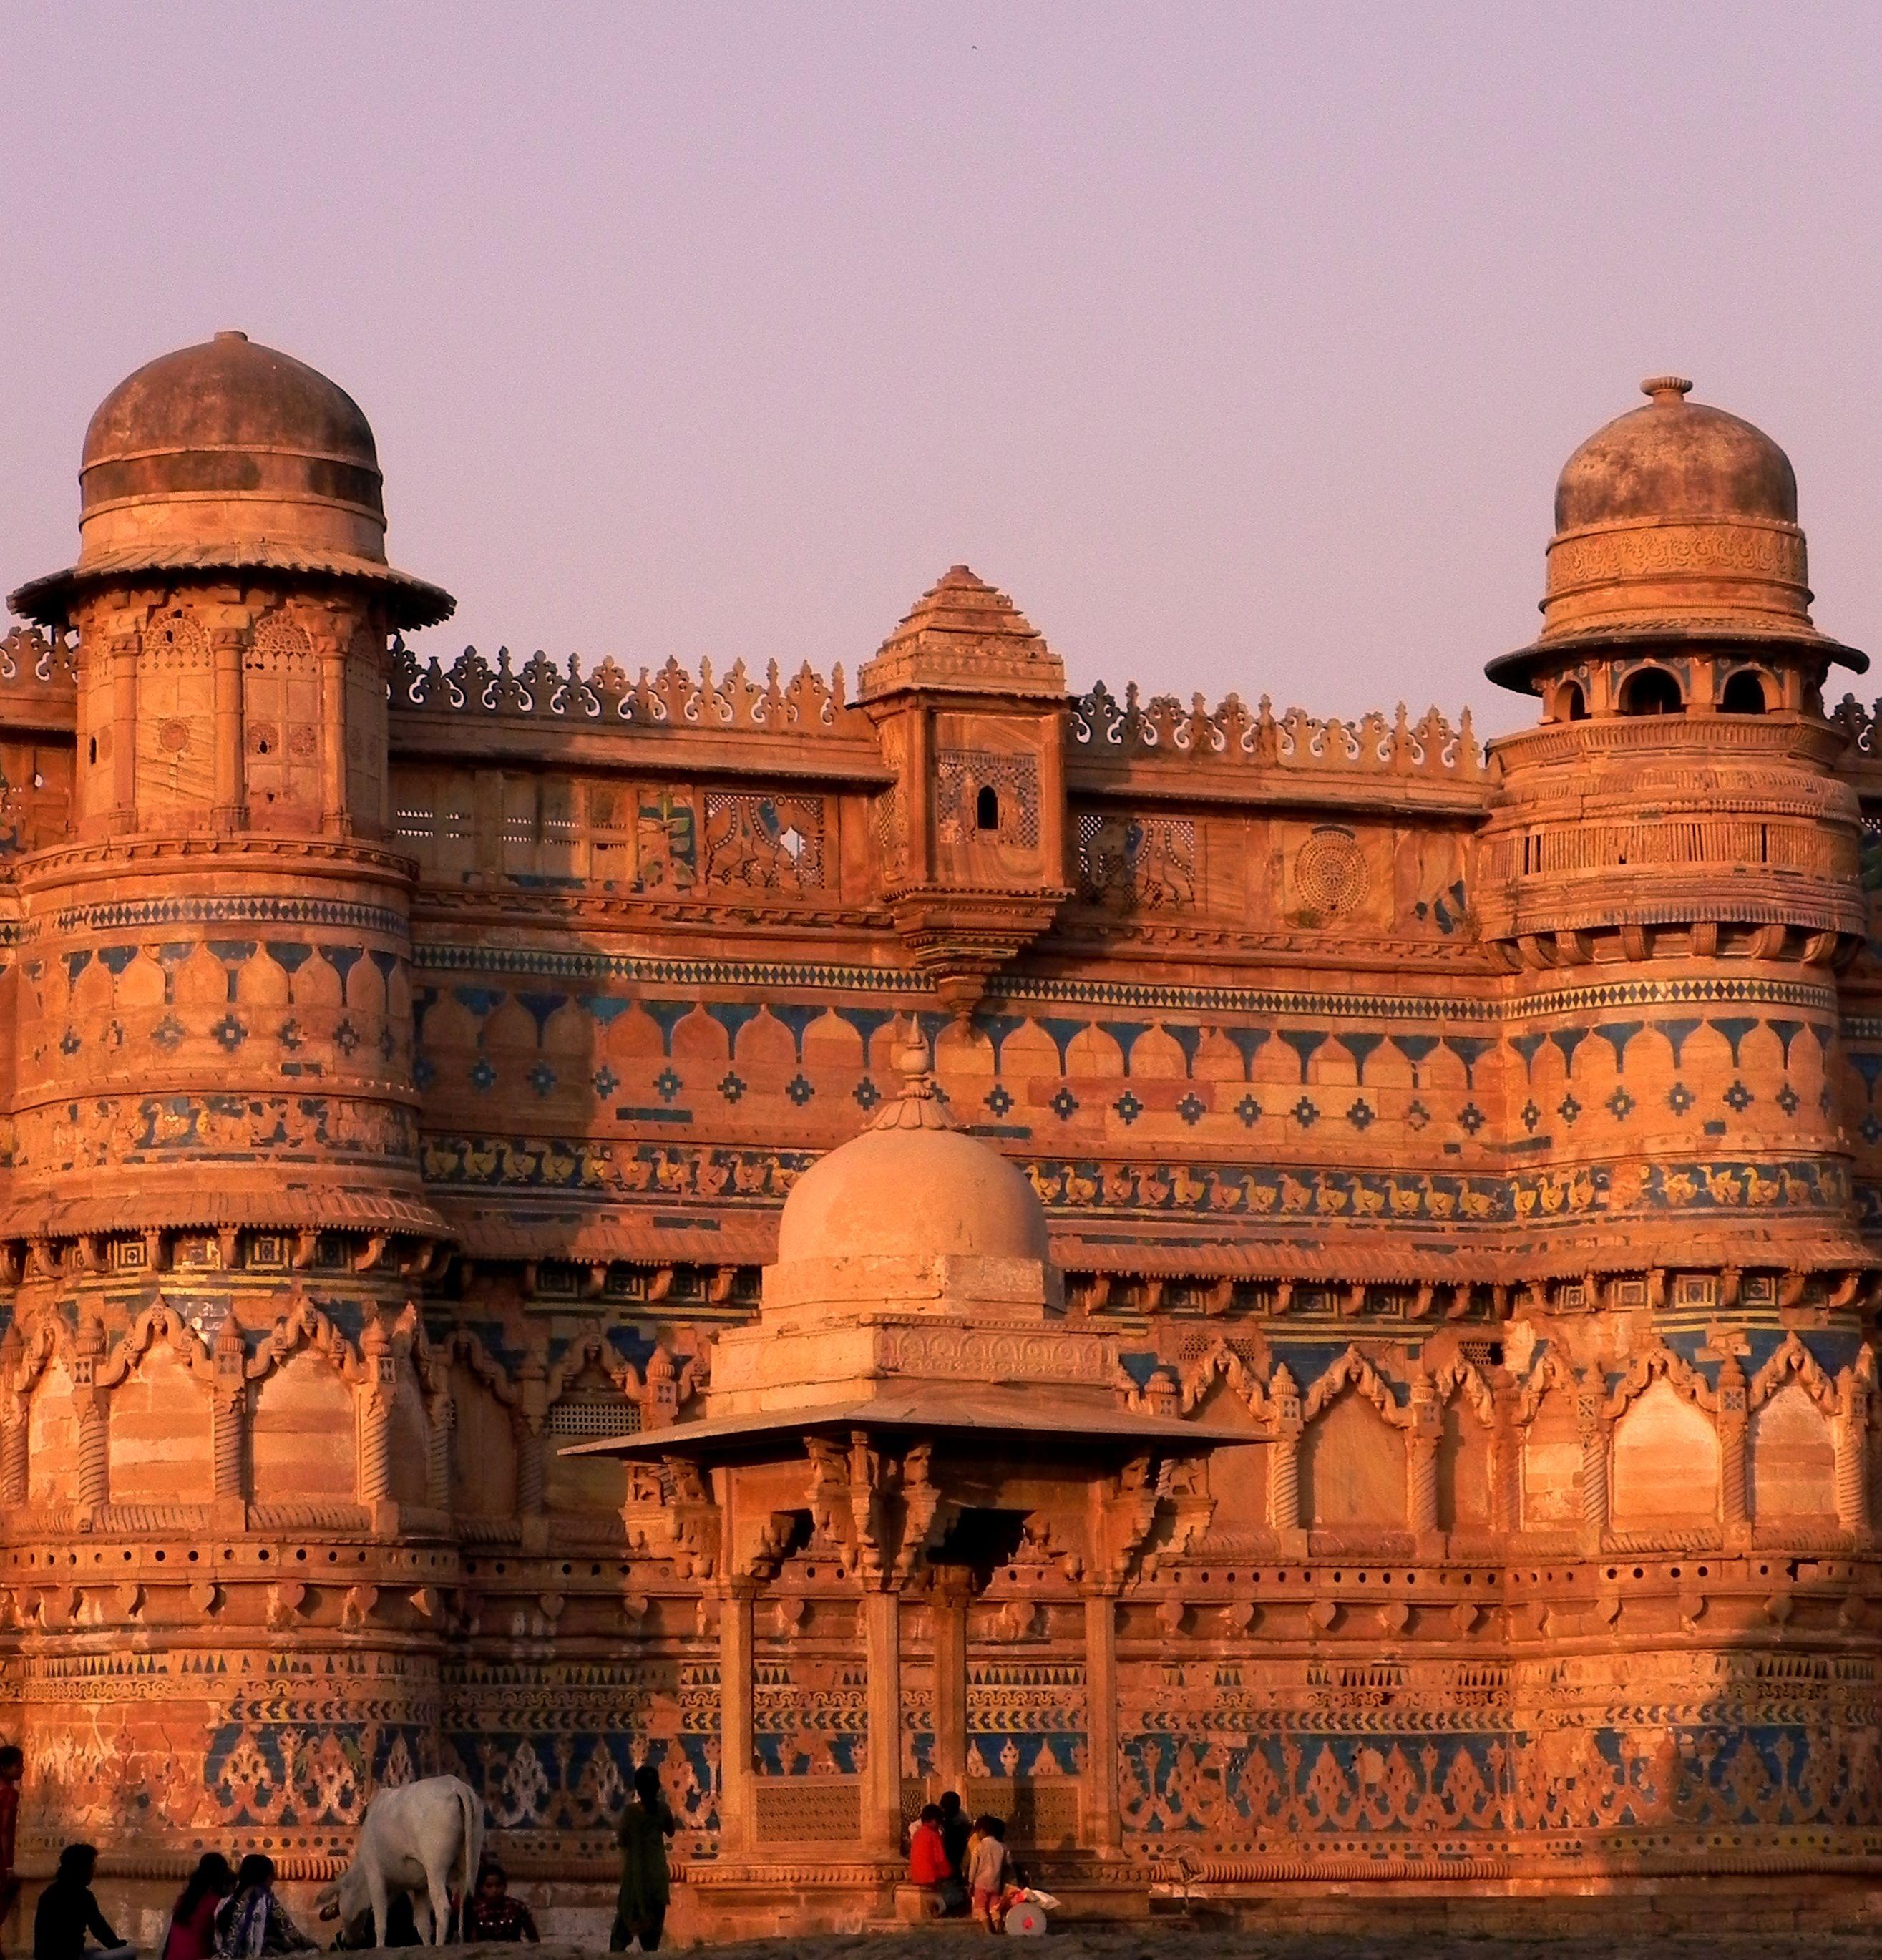 The Gorgeous Gwalior Fort: The 'Maan Mandir Palace' at Gwalior Fort, Gwalior, Madhya Pradesh, India